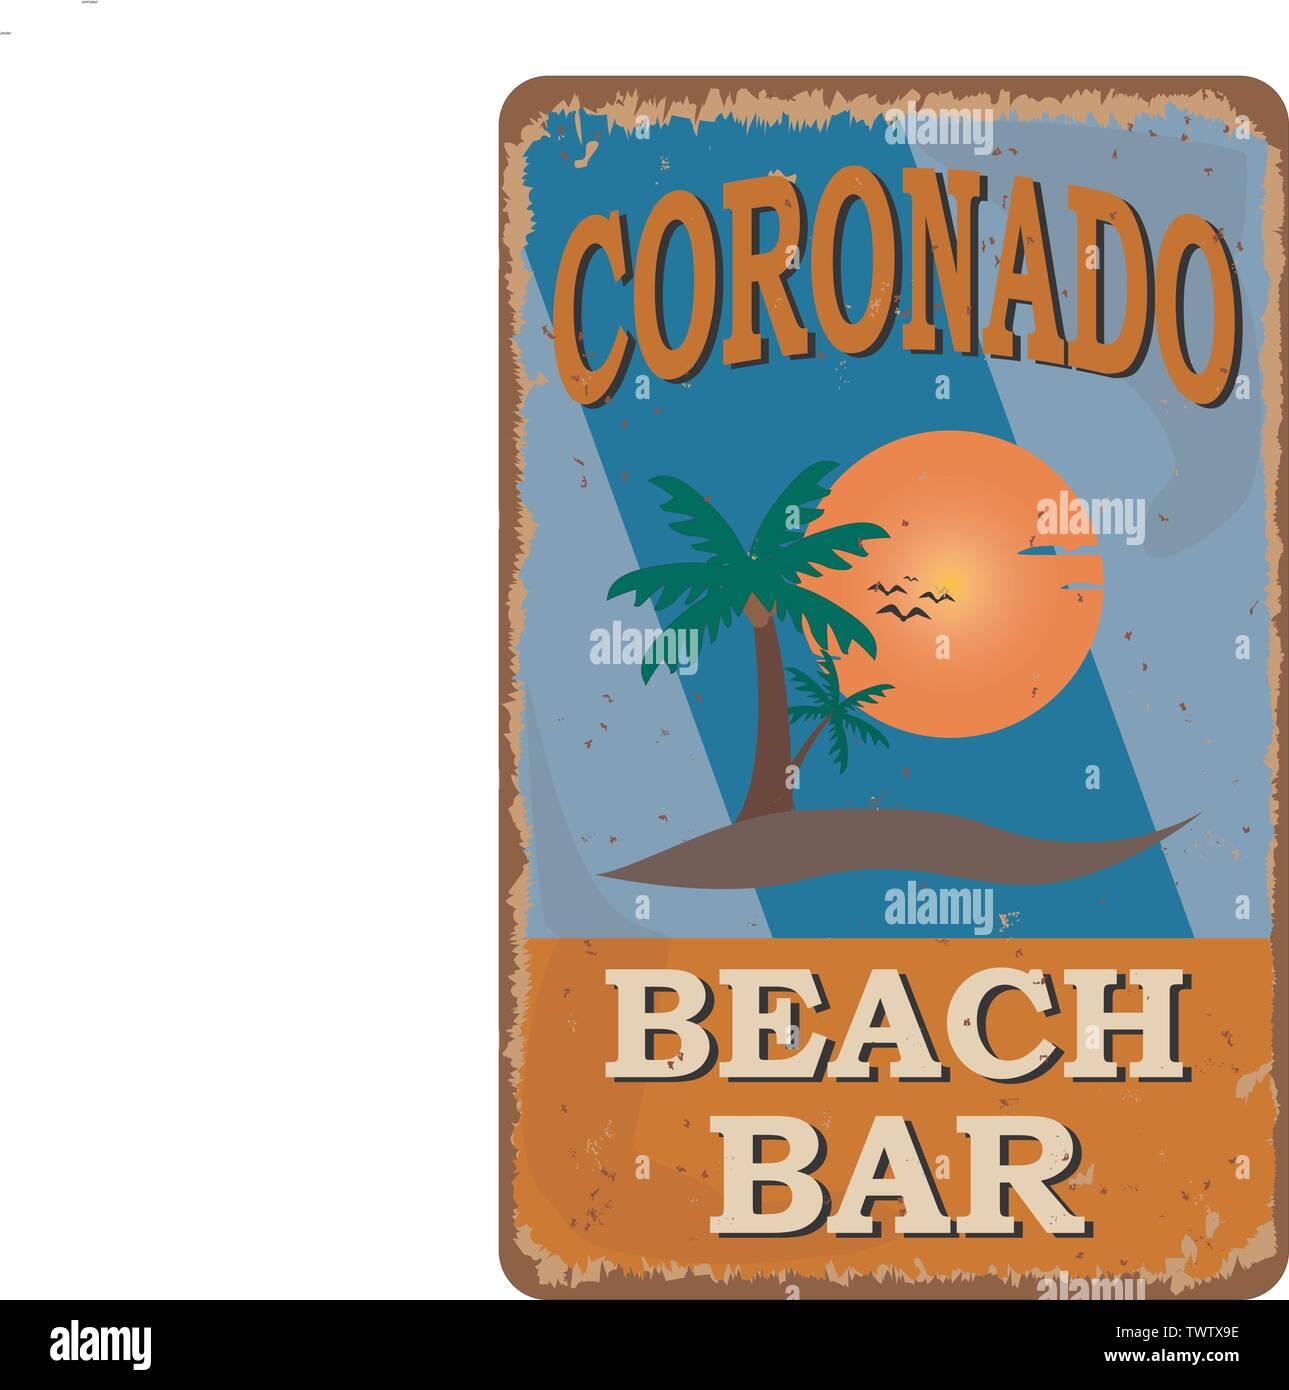 Coronado Beach bar vintage rusty metal sign on a white background, vector illustration - Stock Image